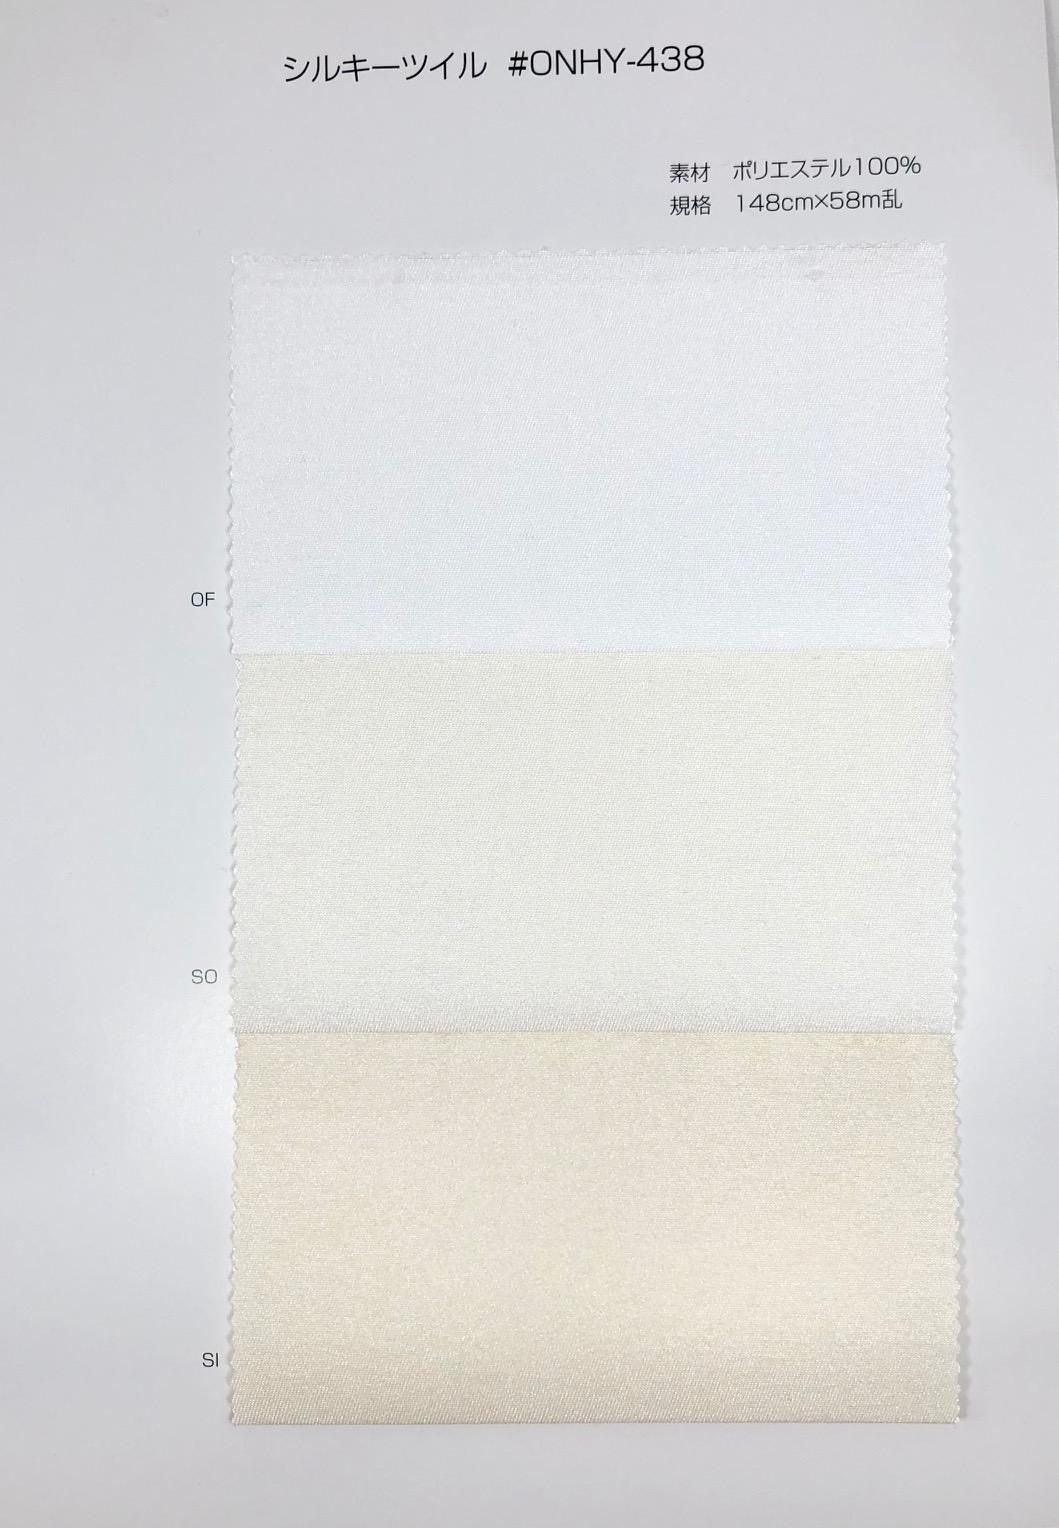 ONHY438 シルキーツイル[生地] サンコロナ小田/オークラ商事 - ApparelX アパレル資材卸通販